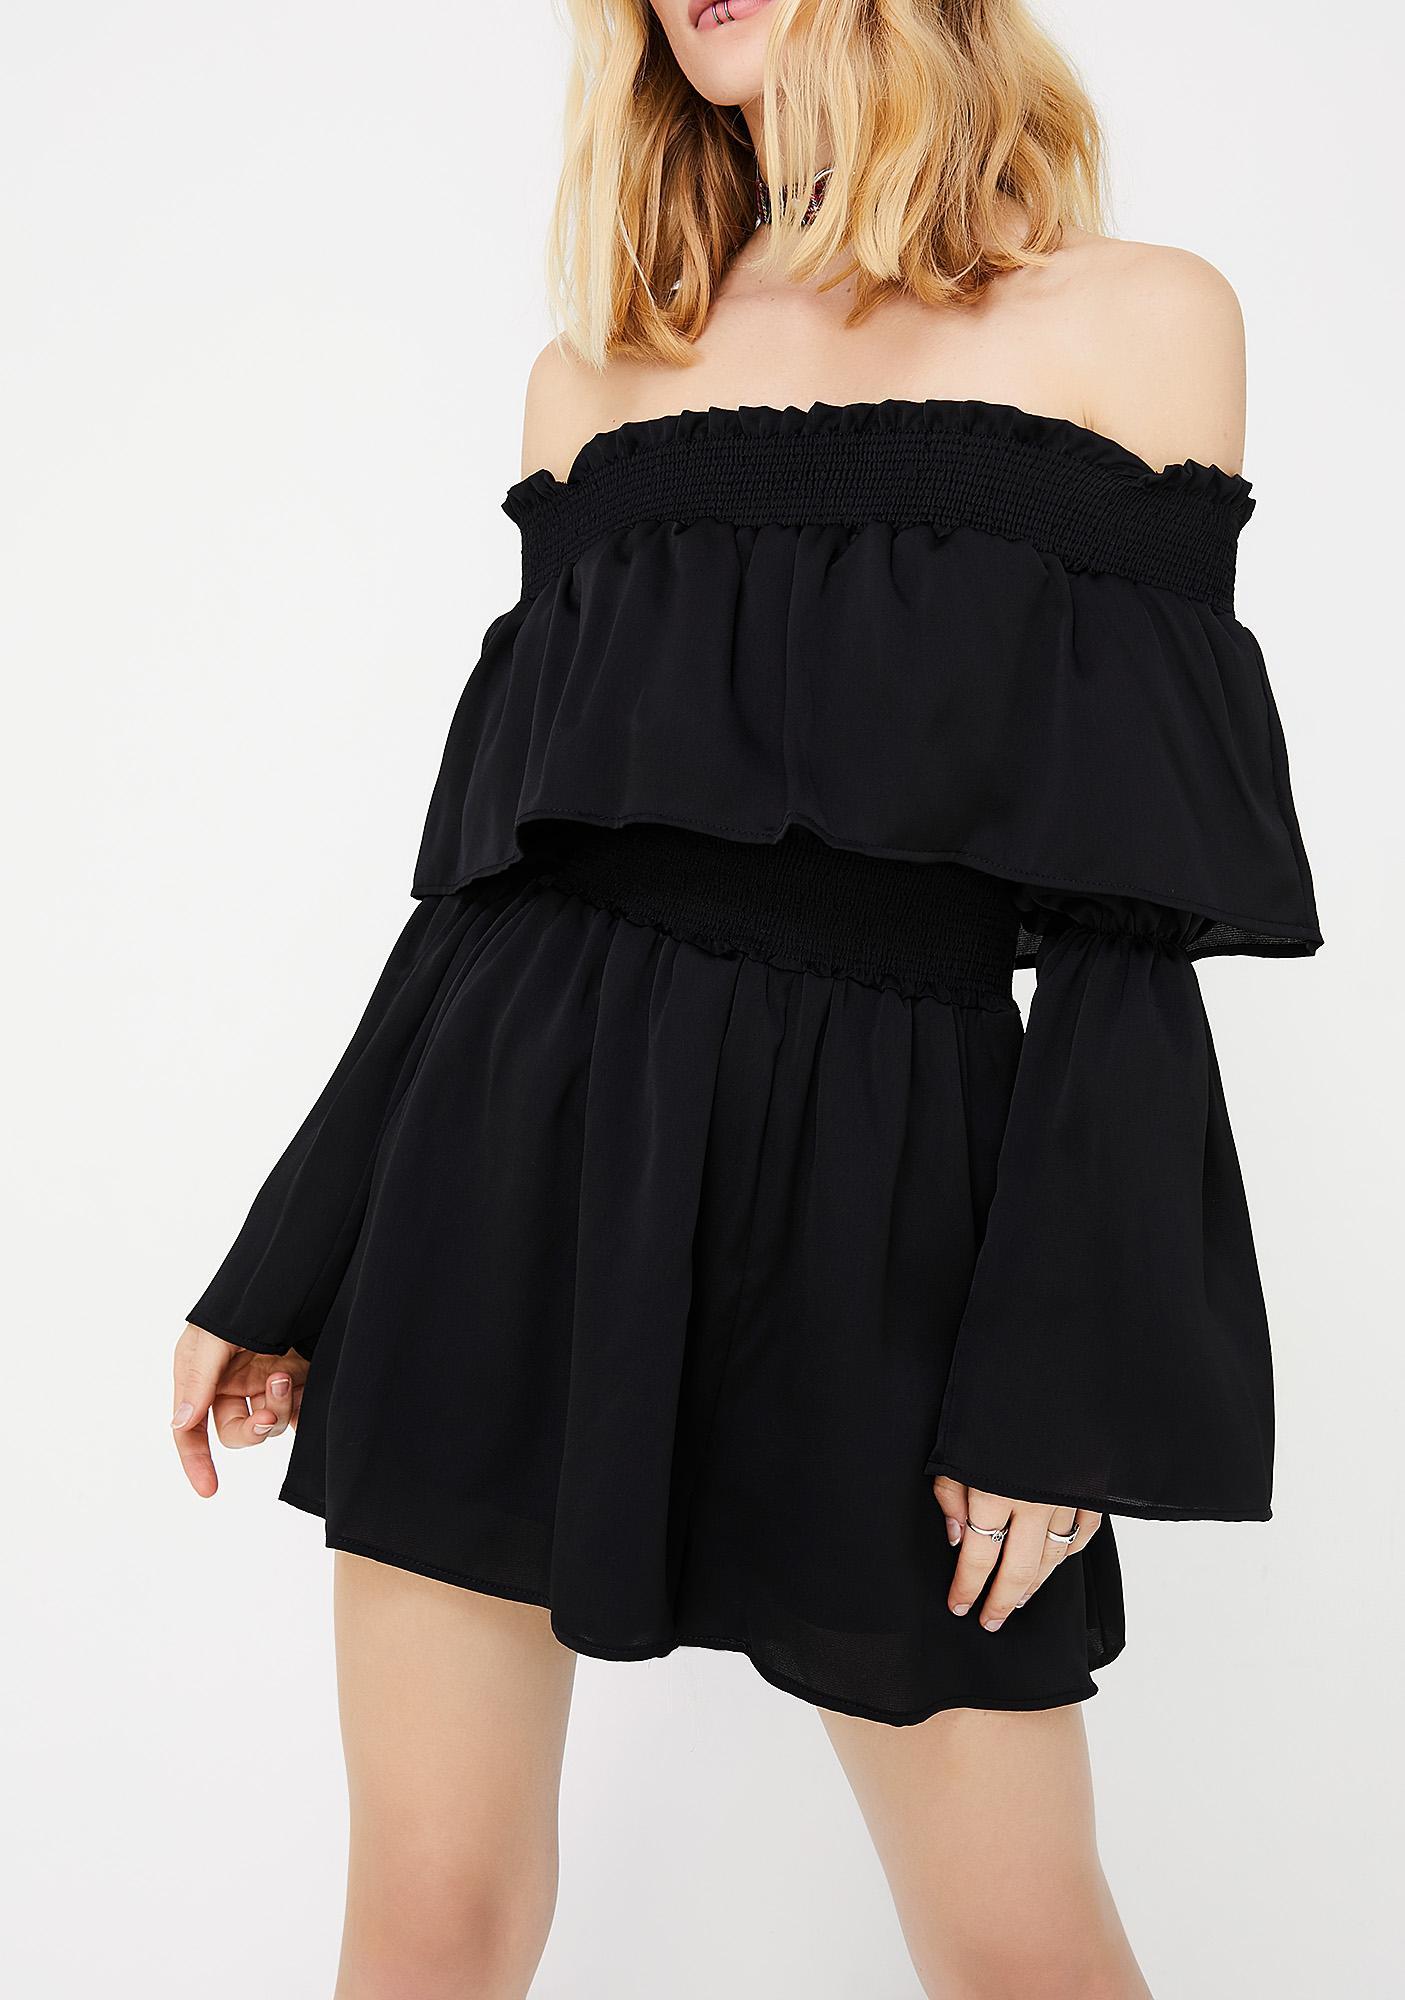 In Tiers Mini Dress